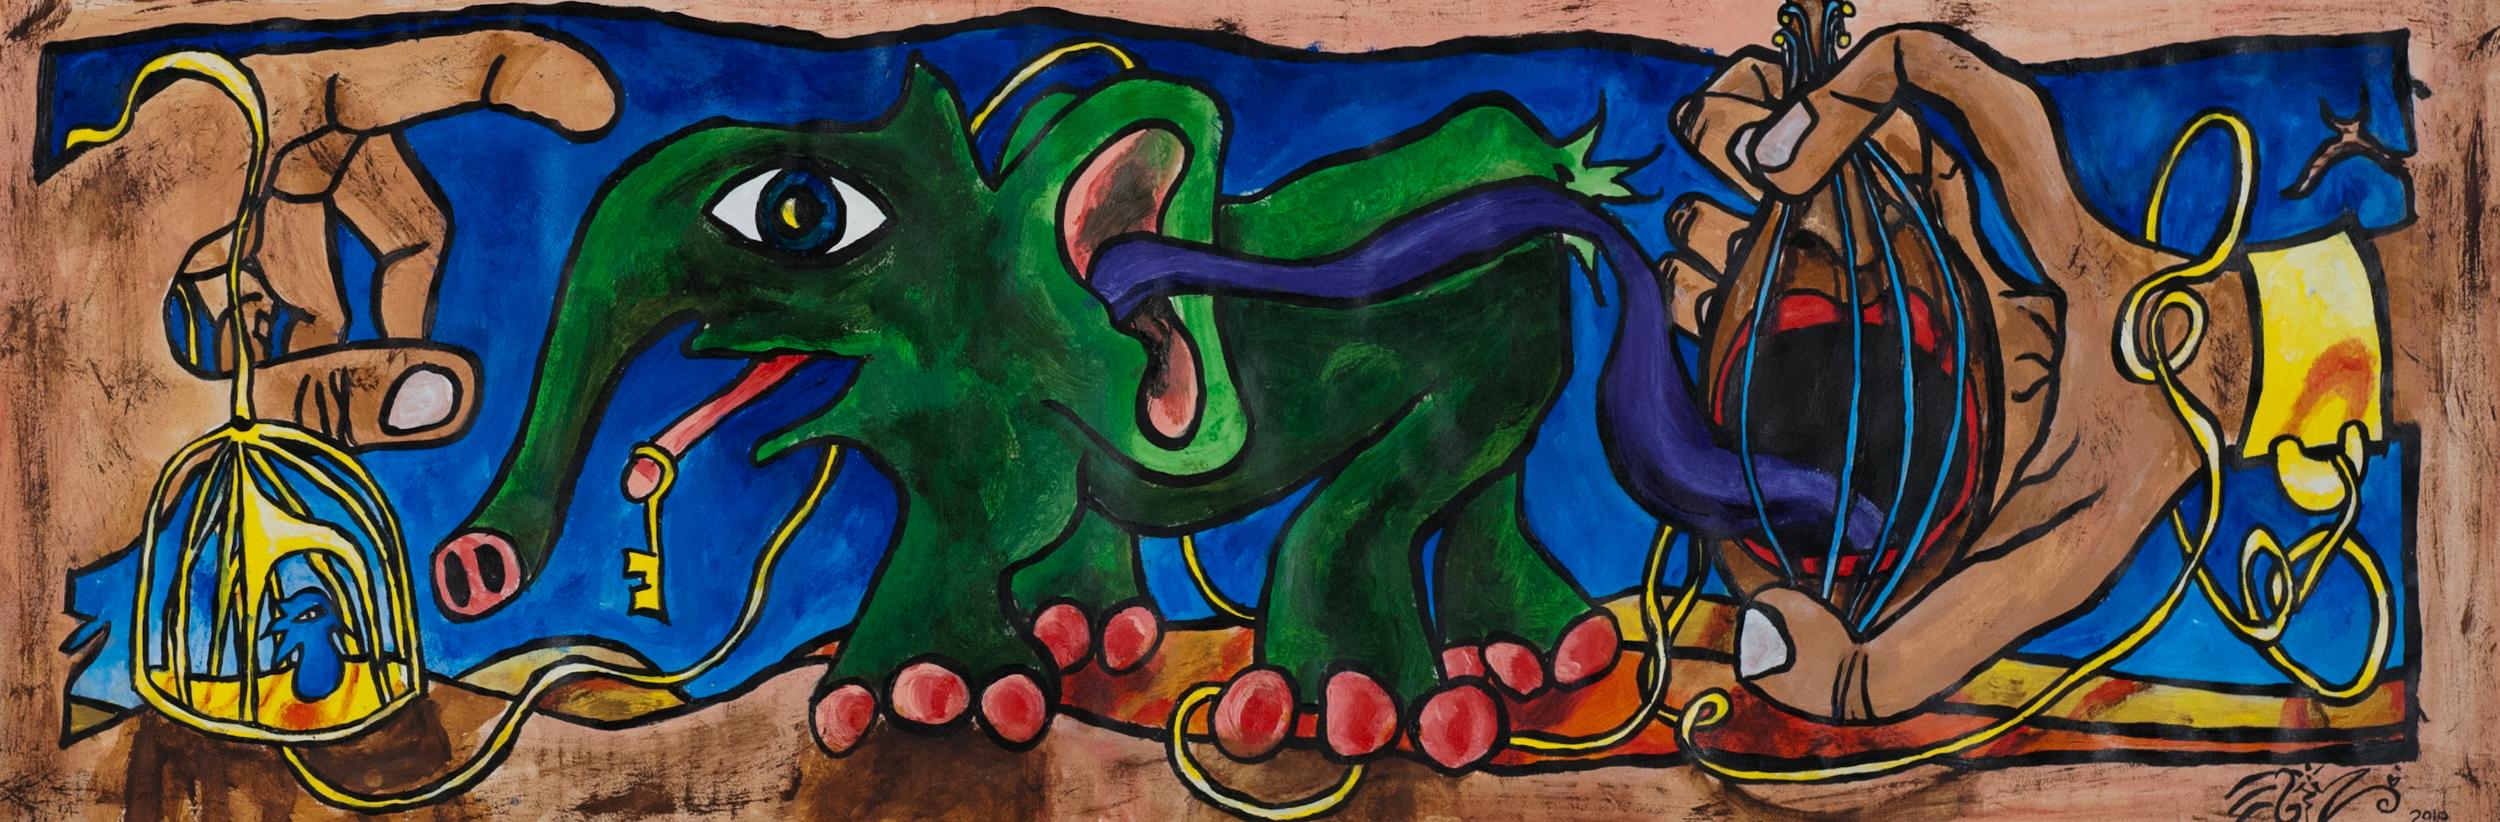 "Freedom song by Eliza Furmansky  Acrylic on paper. 8"" x 24"". 2010"